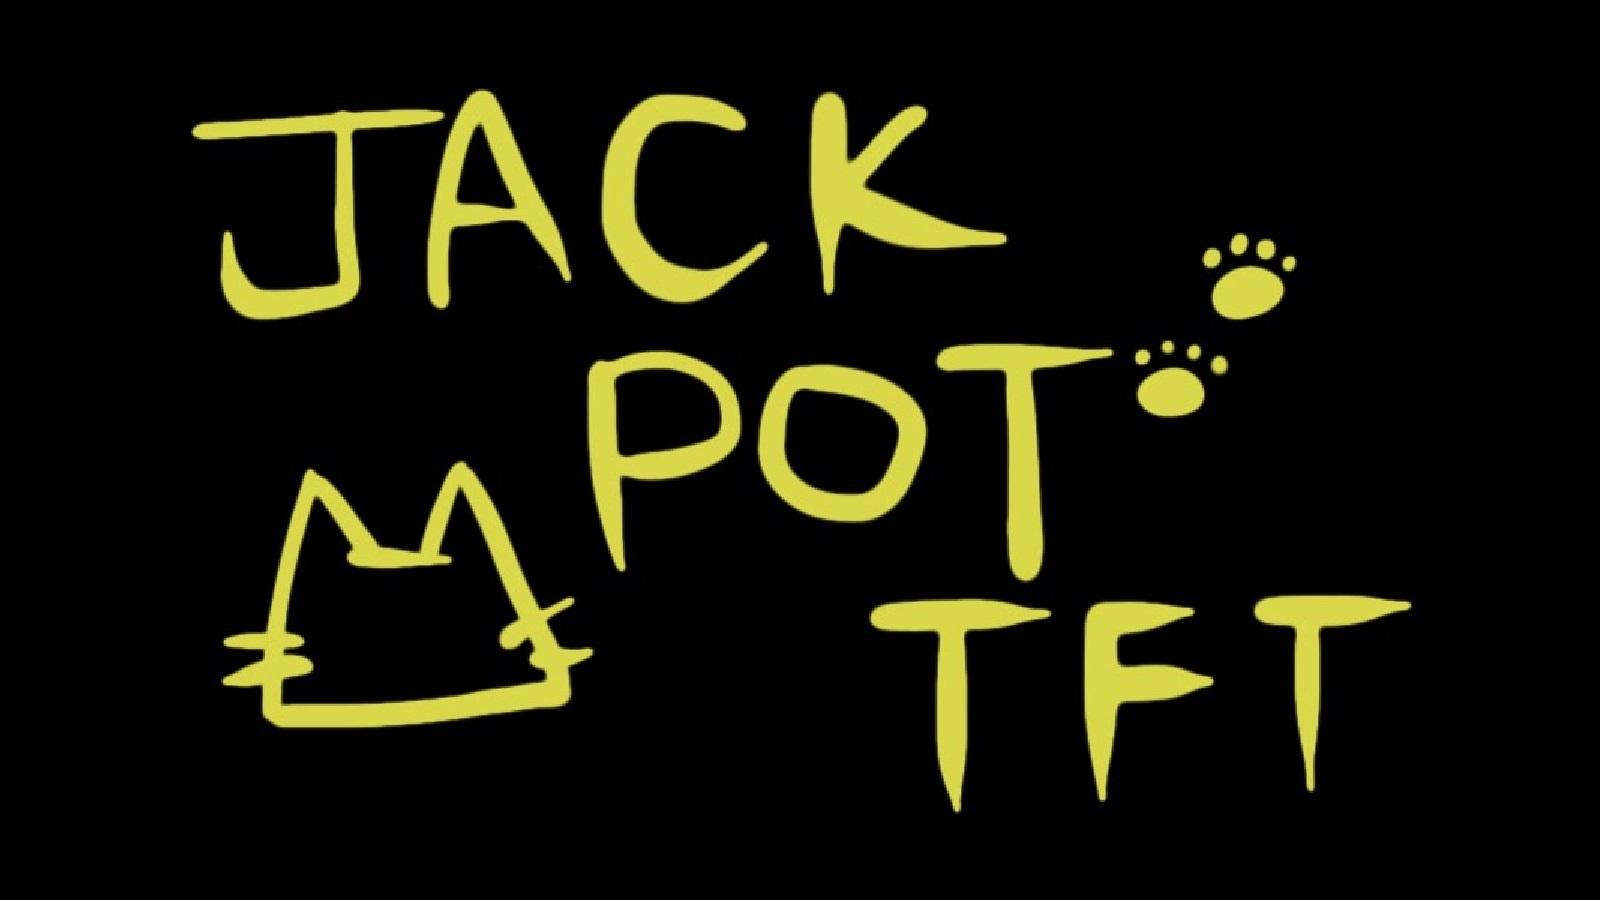 「JACKPOT TFT vol.2」開催決定!